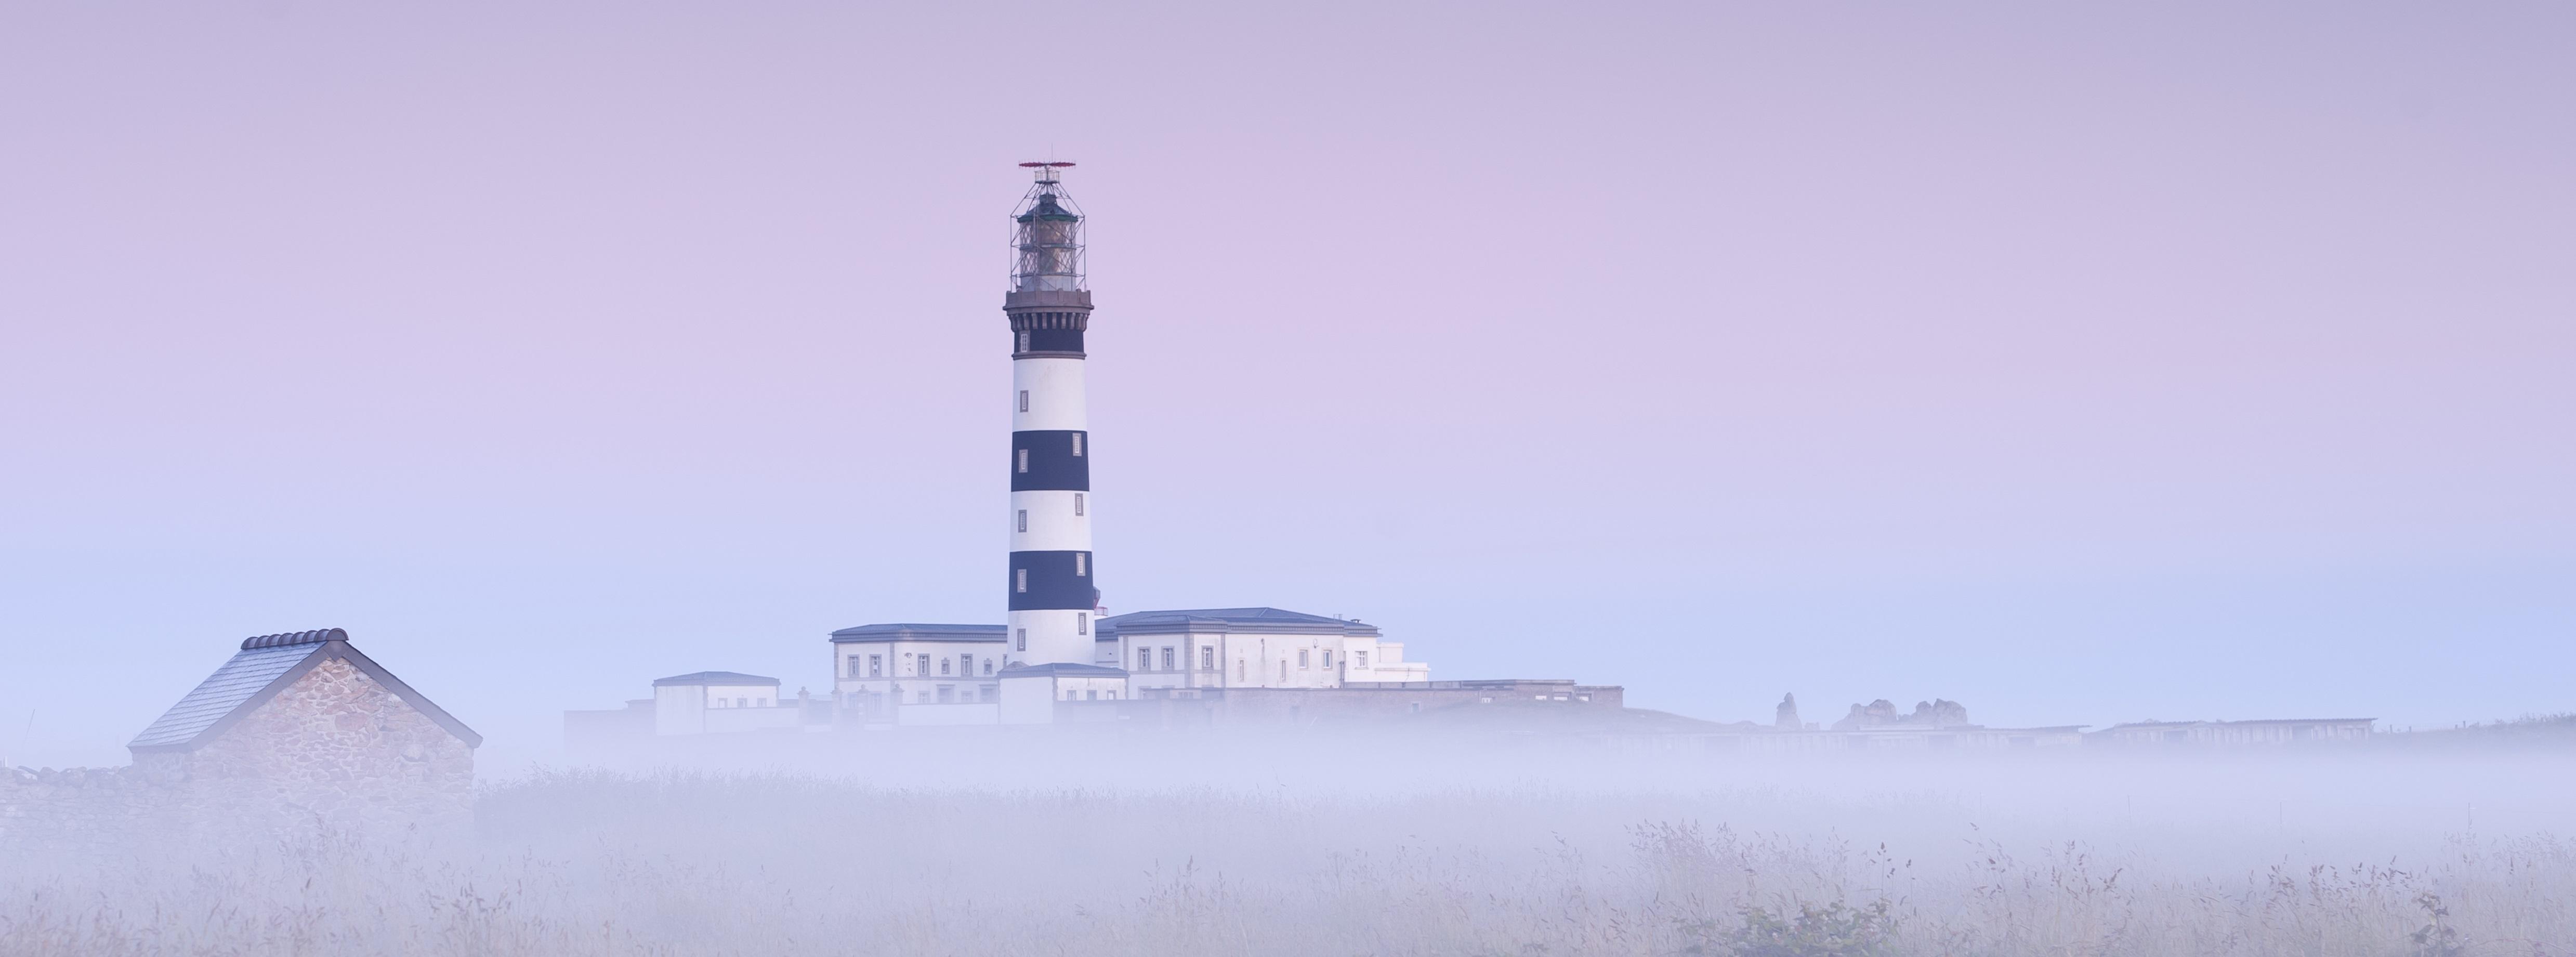 Top 5 des phares à visiter en Finistère